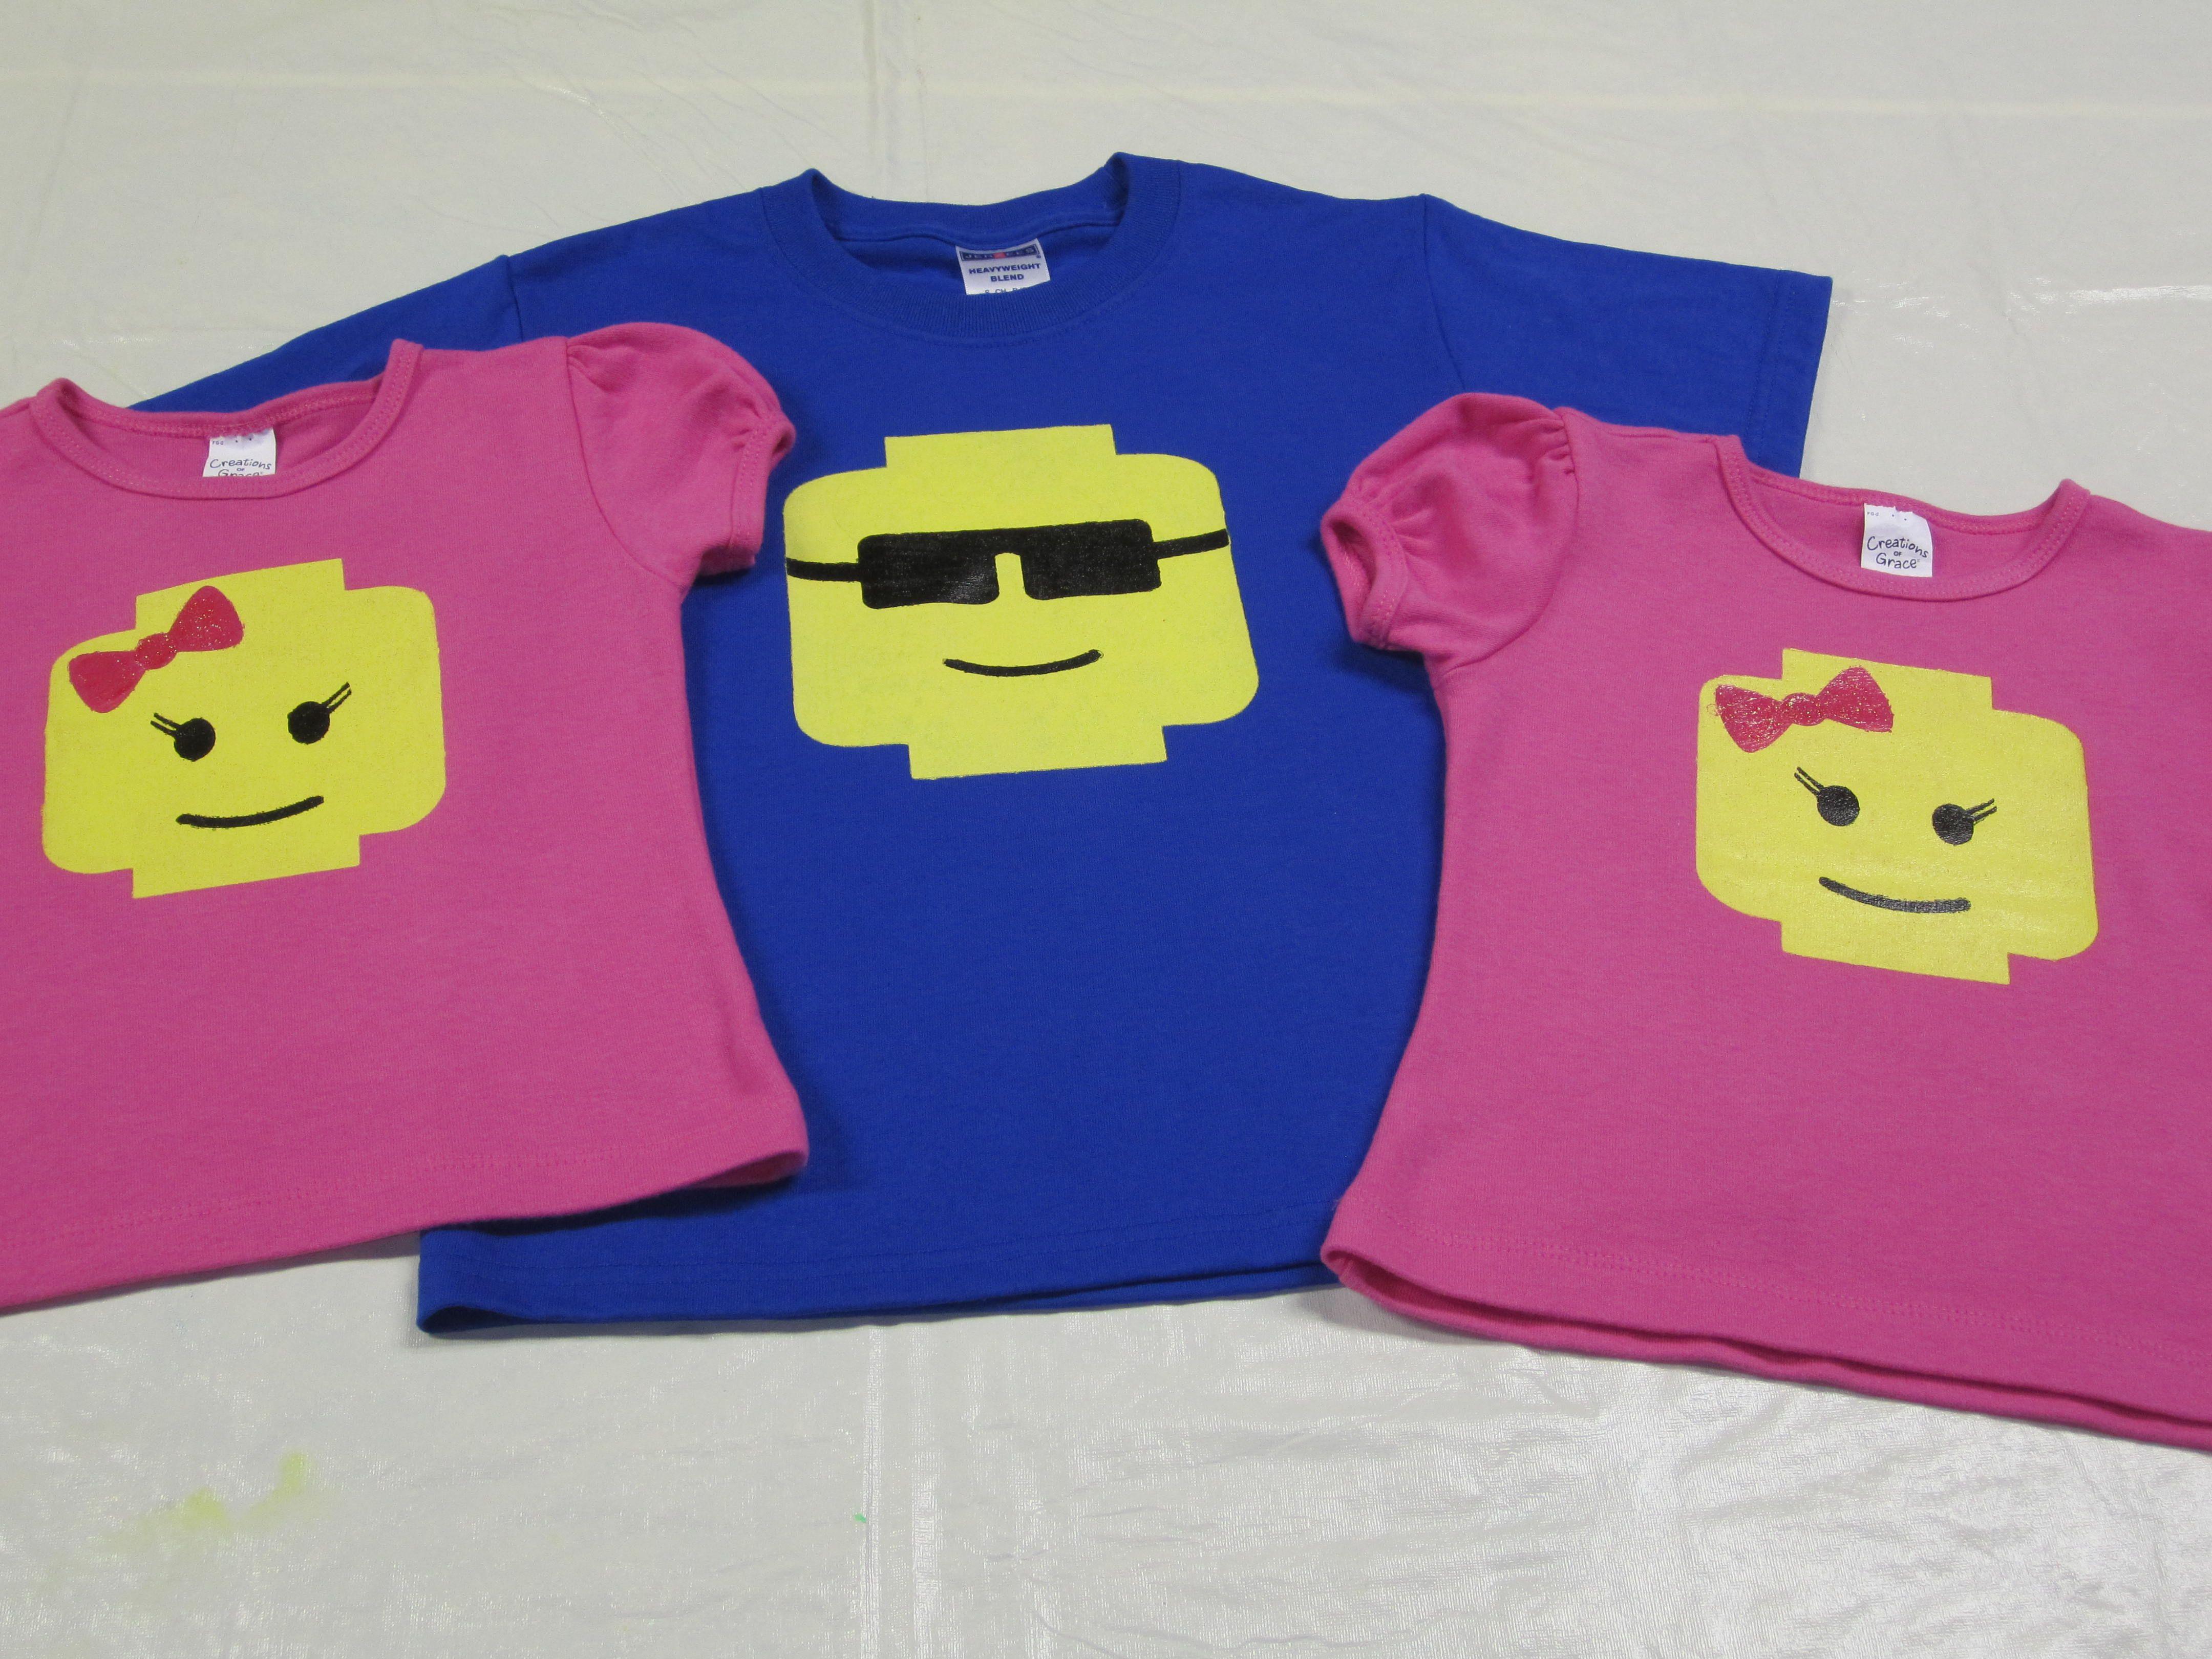 Lego Guy and Girl T Shirts made using Cricut Craft Room Freezer